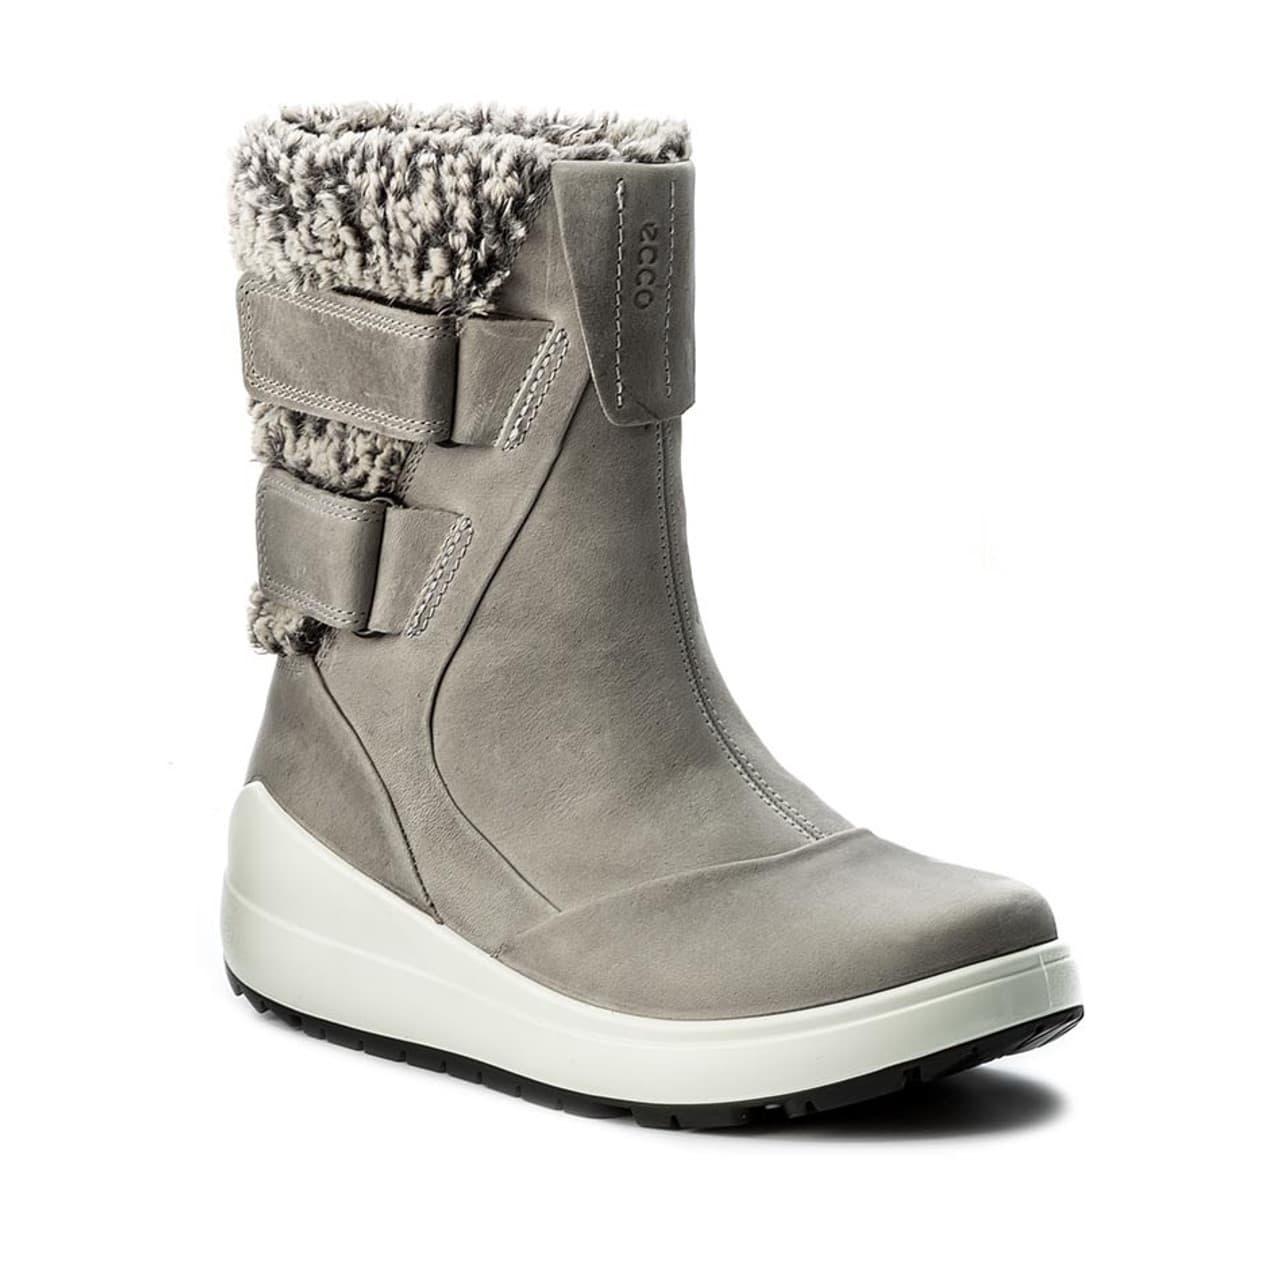 0b4ed18730 ECCO NOYCE - 121 Shoes